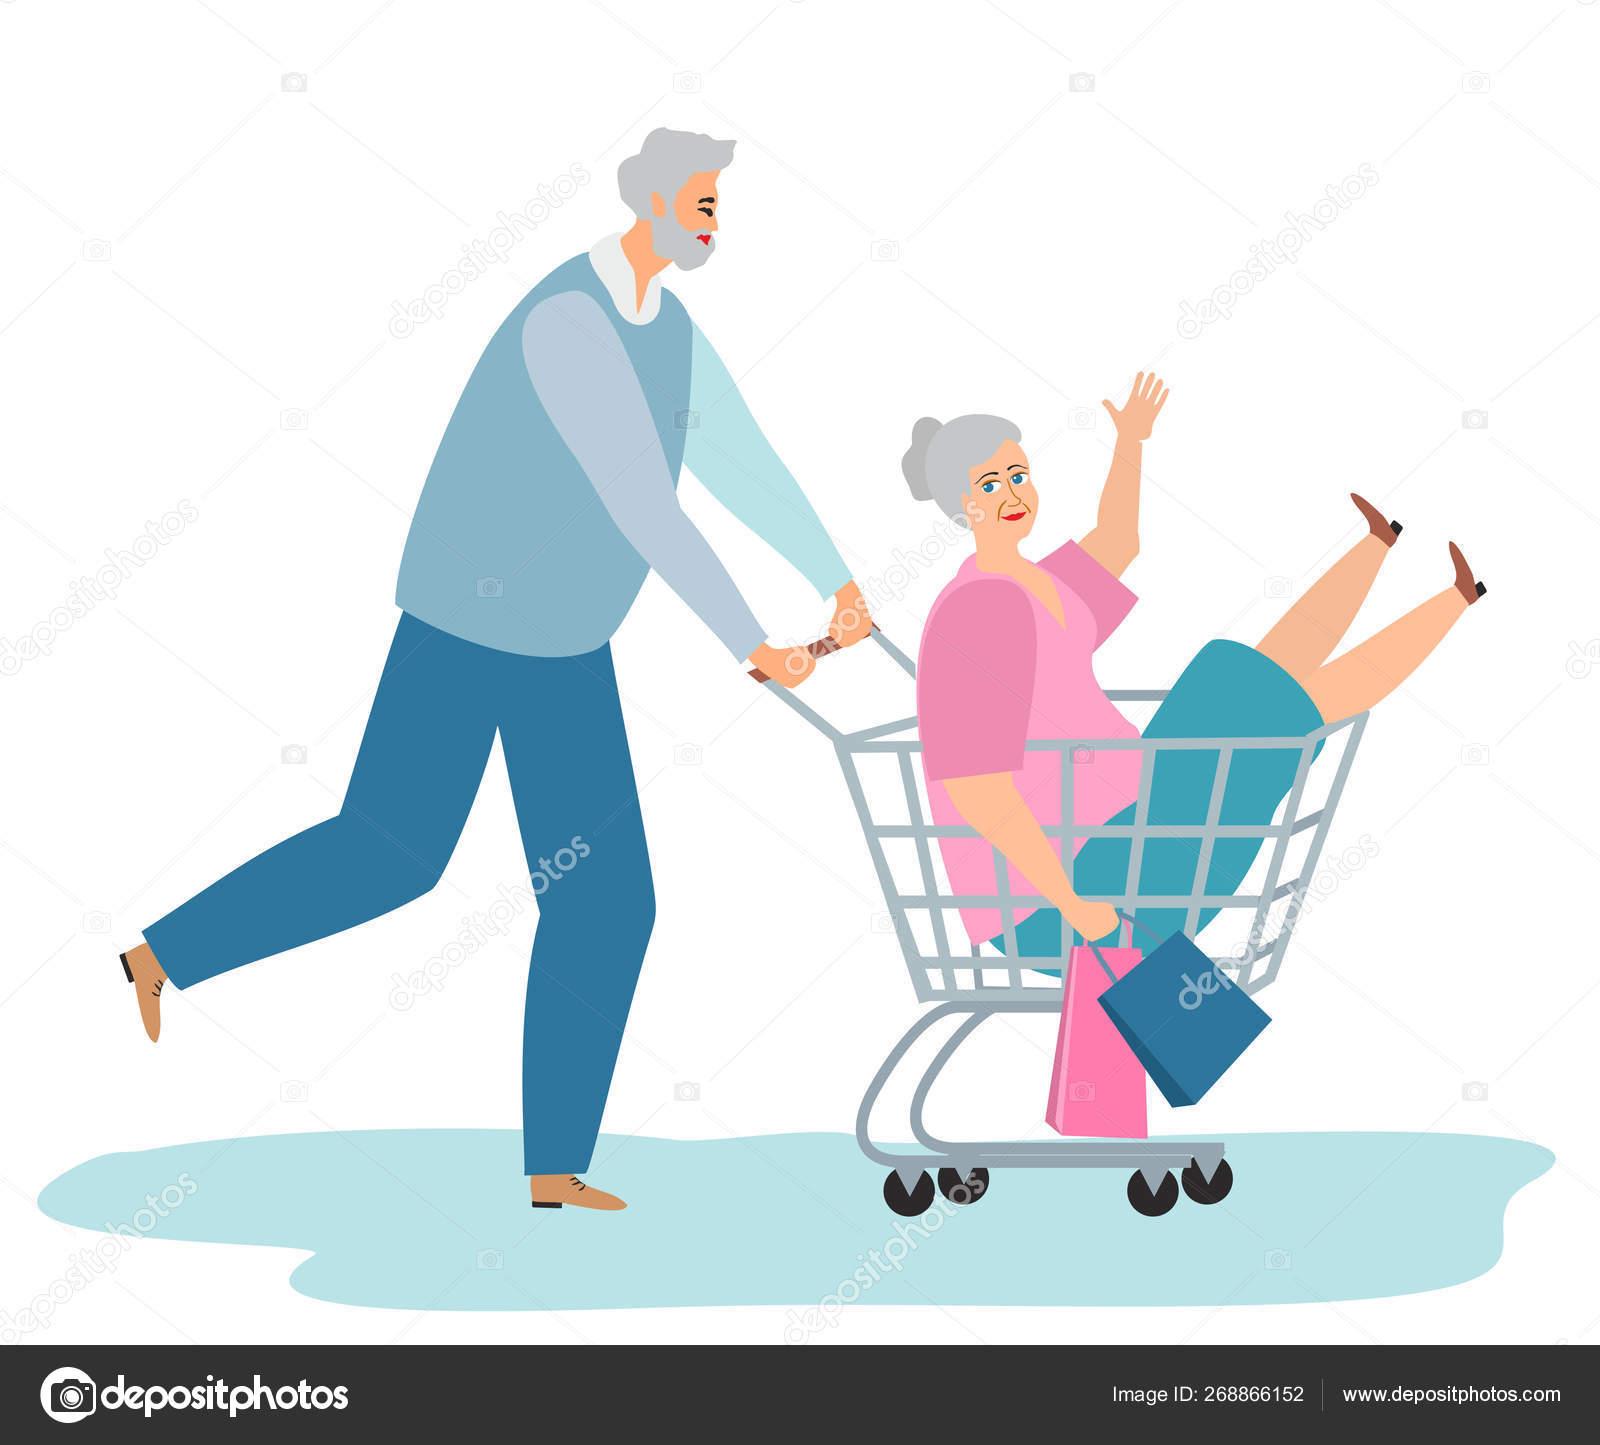 Vector Racing Shopping Trolley Cartoon Illustration Elderly People Shopping Fun Stock Vector C Luisvv 268866152